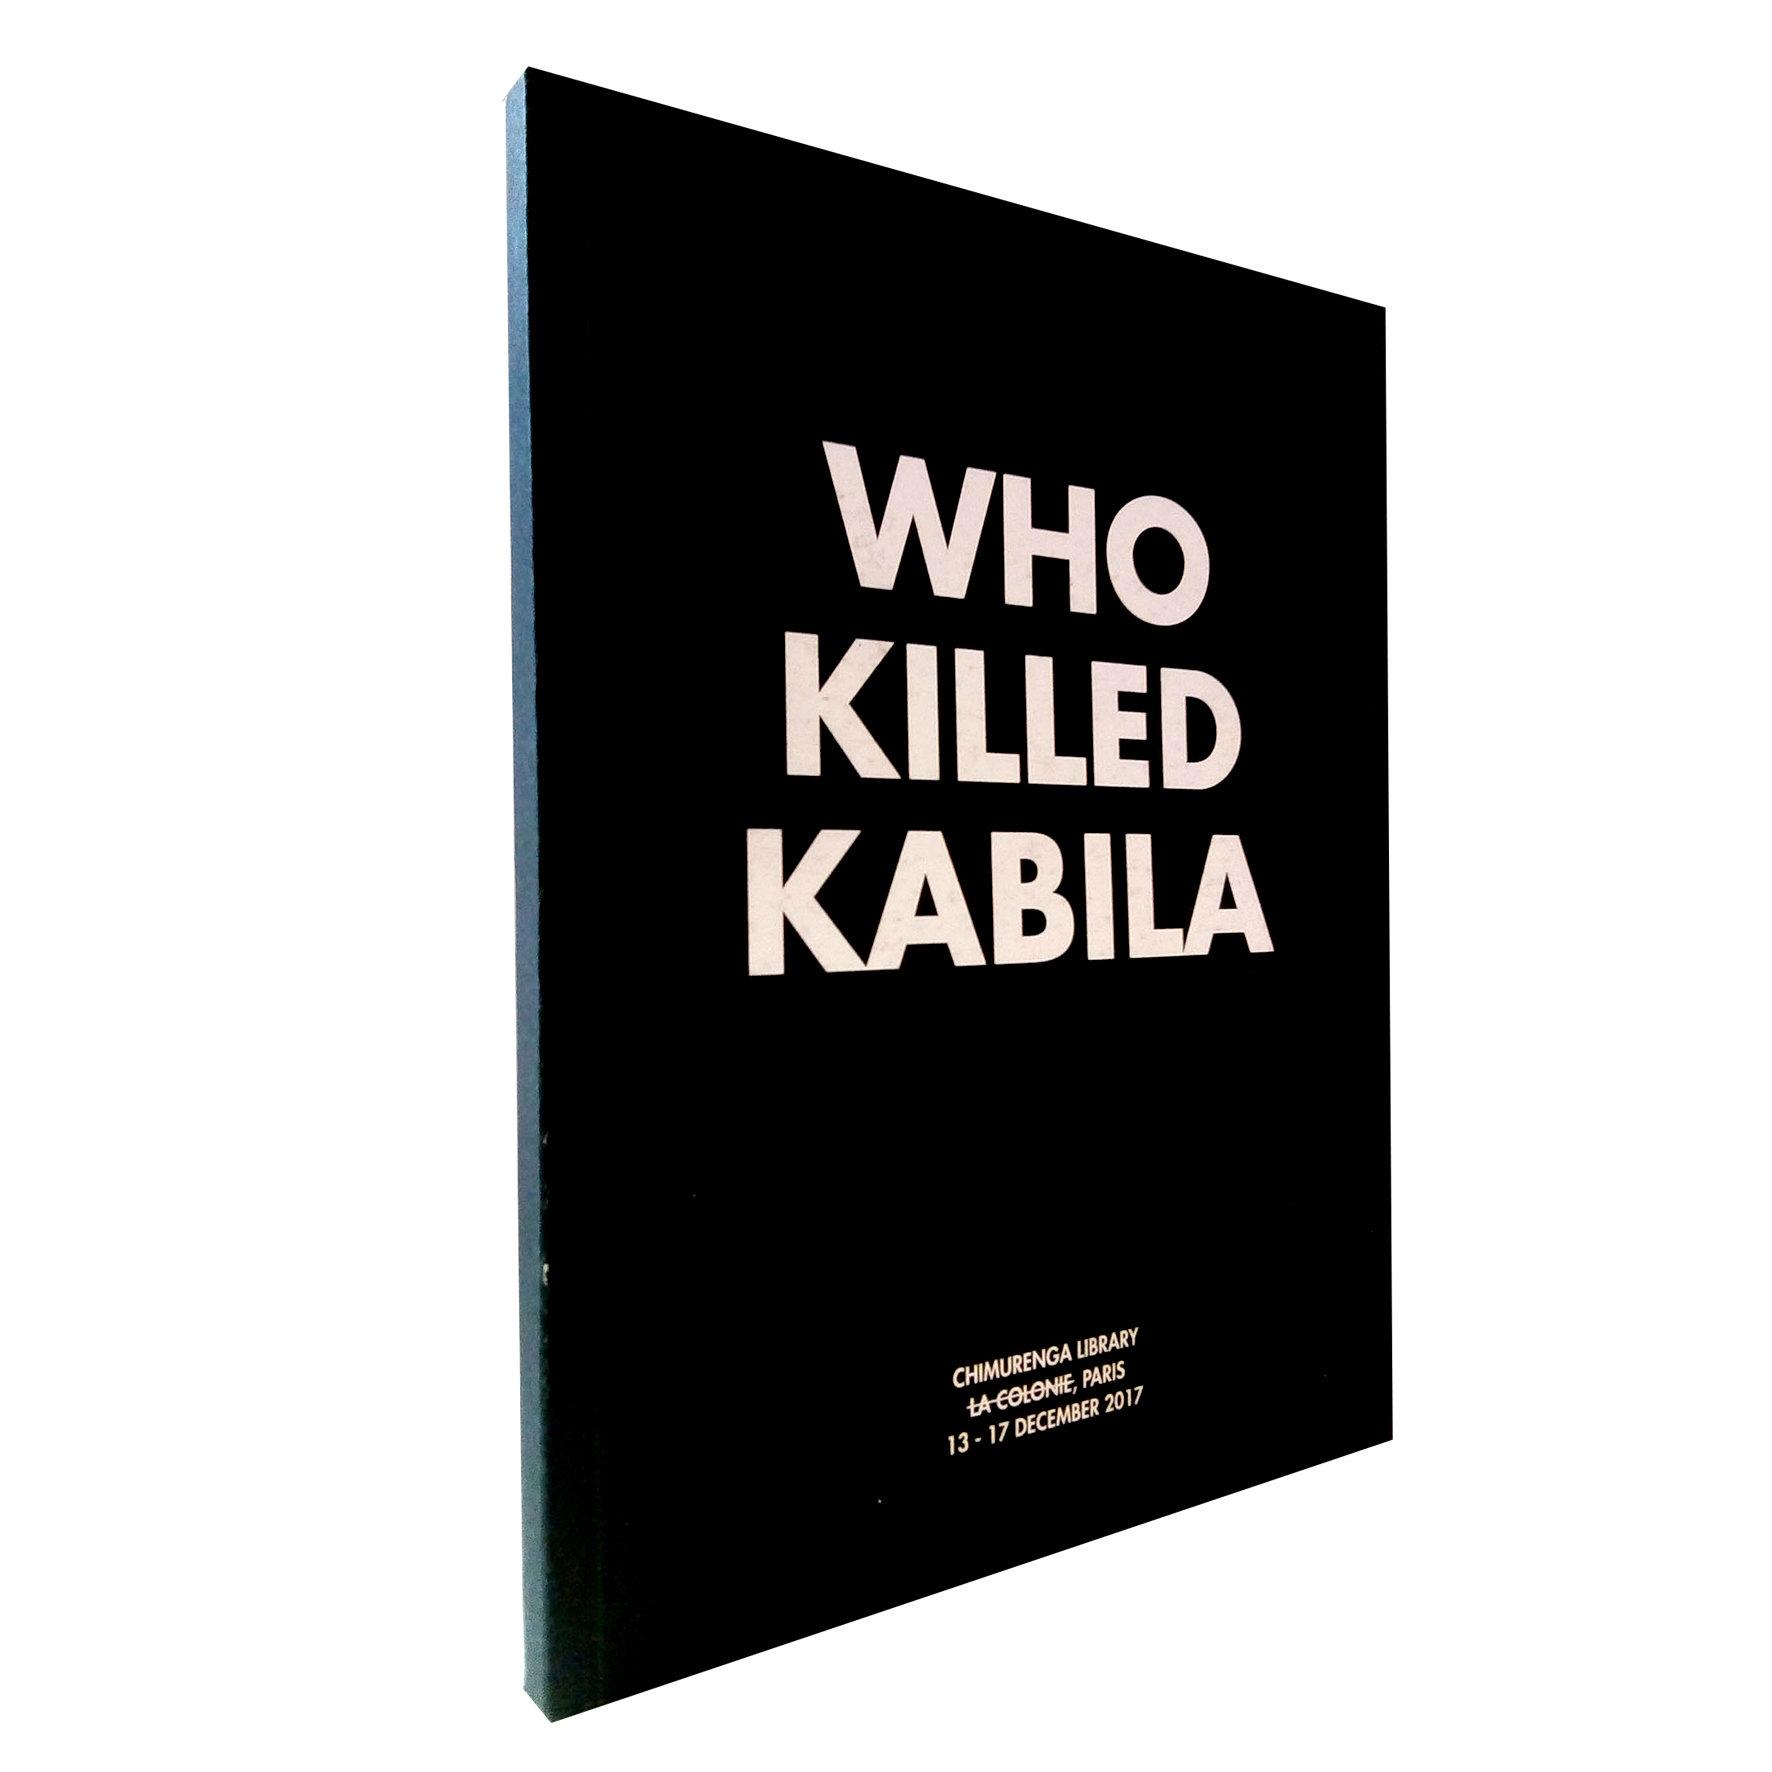 Who Killed Kabila (December, 2017) CIR01